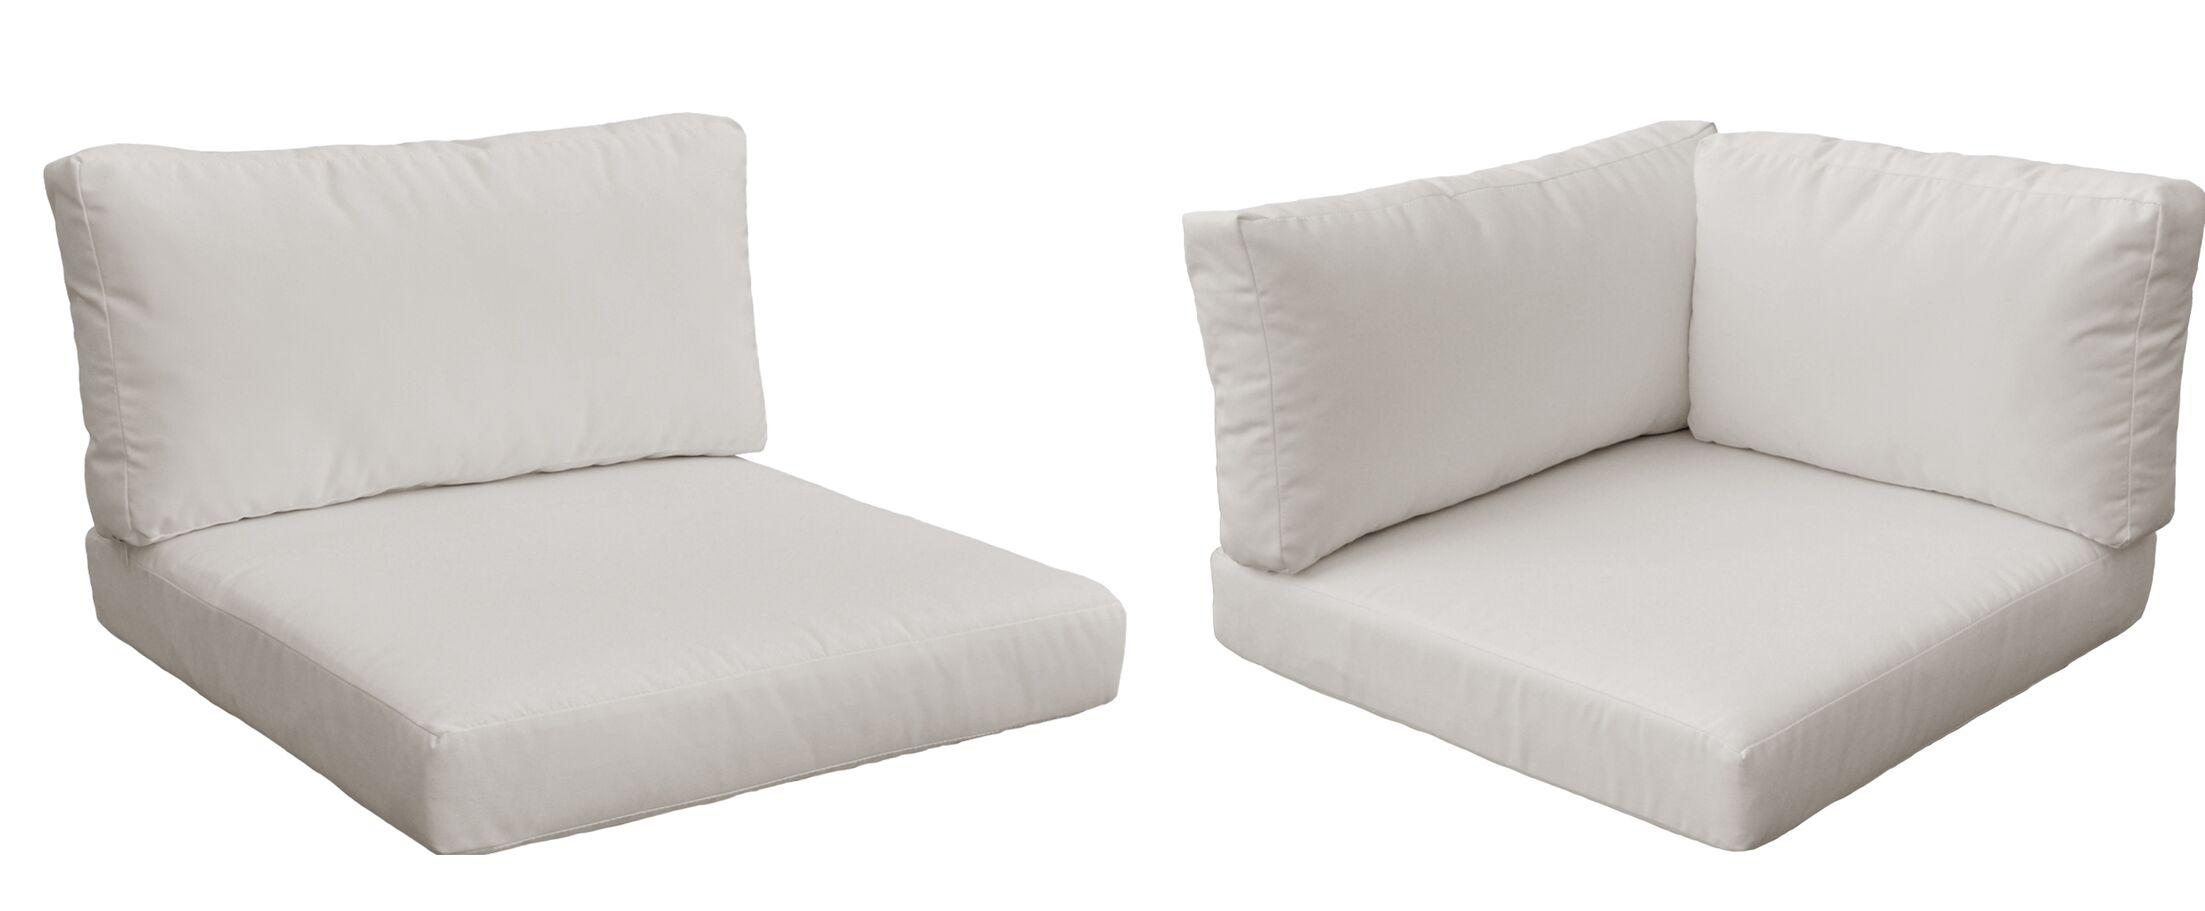 Belle 17 Piece Outdoor Cushion Set Fabric: Beige